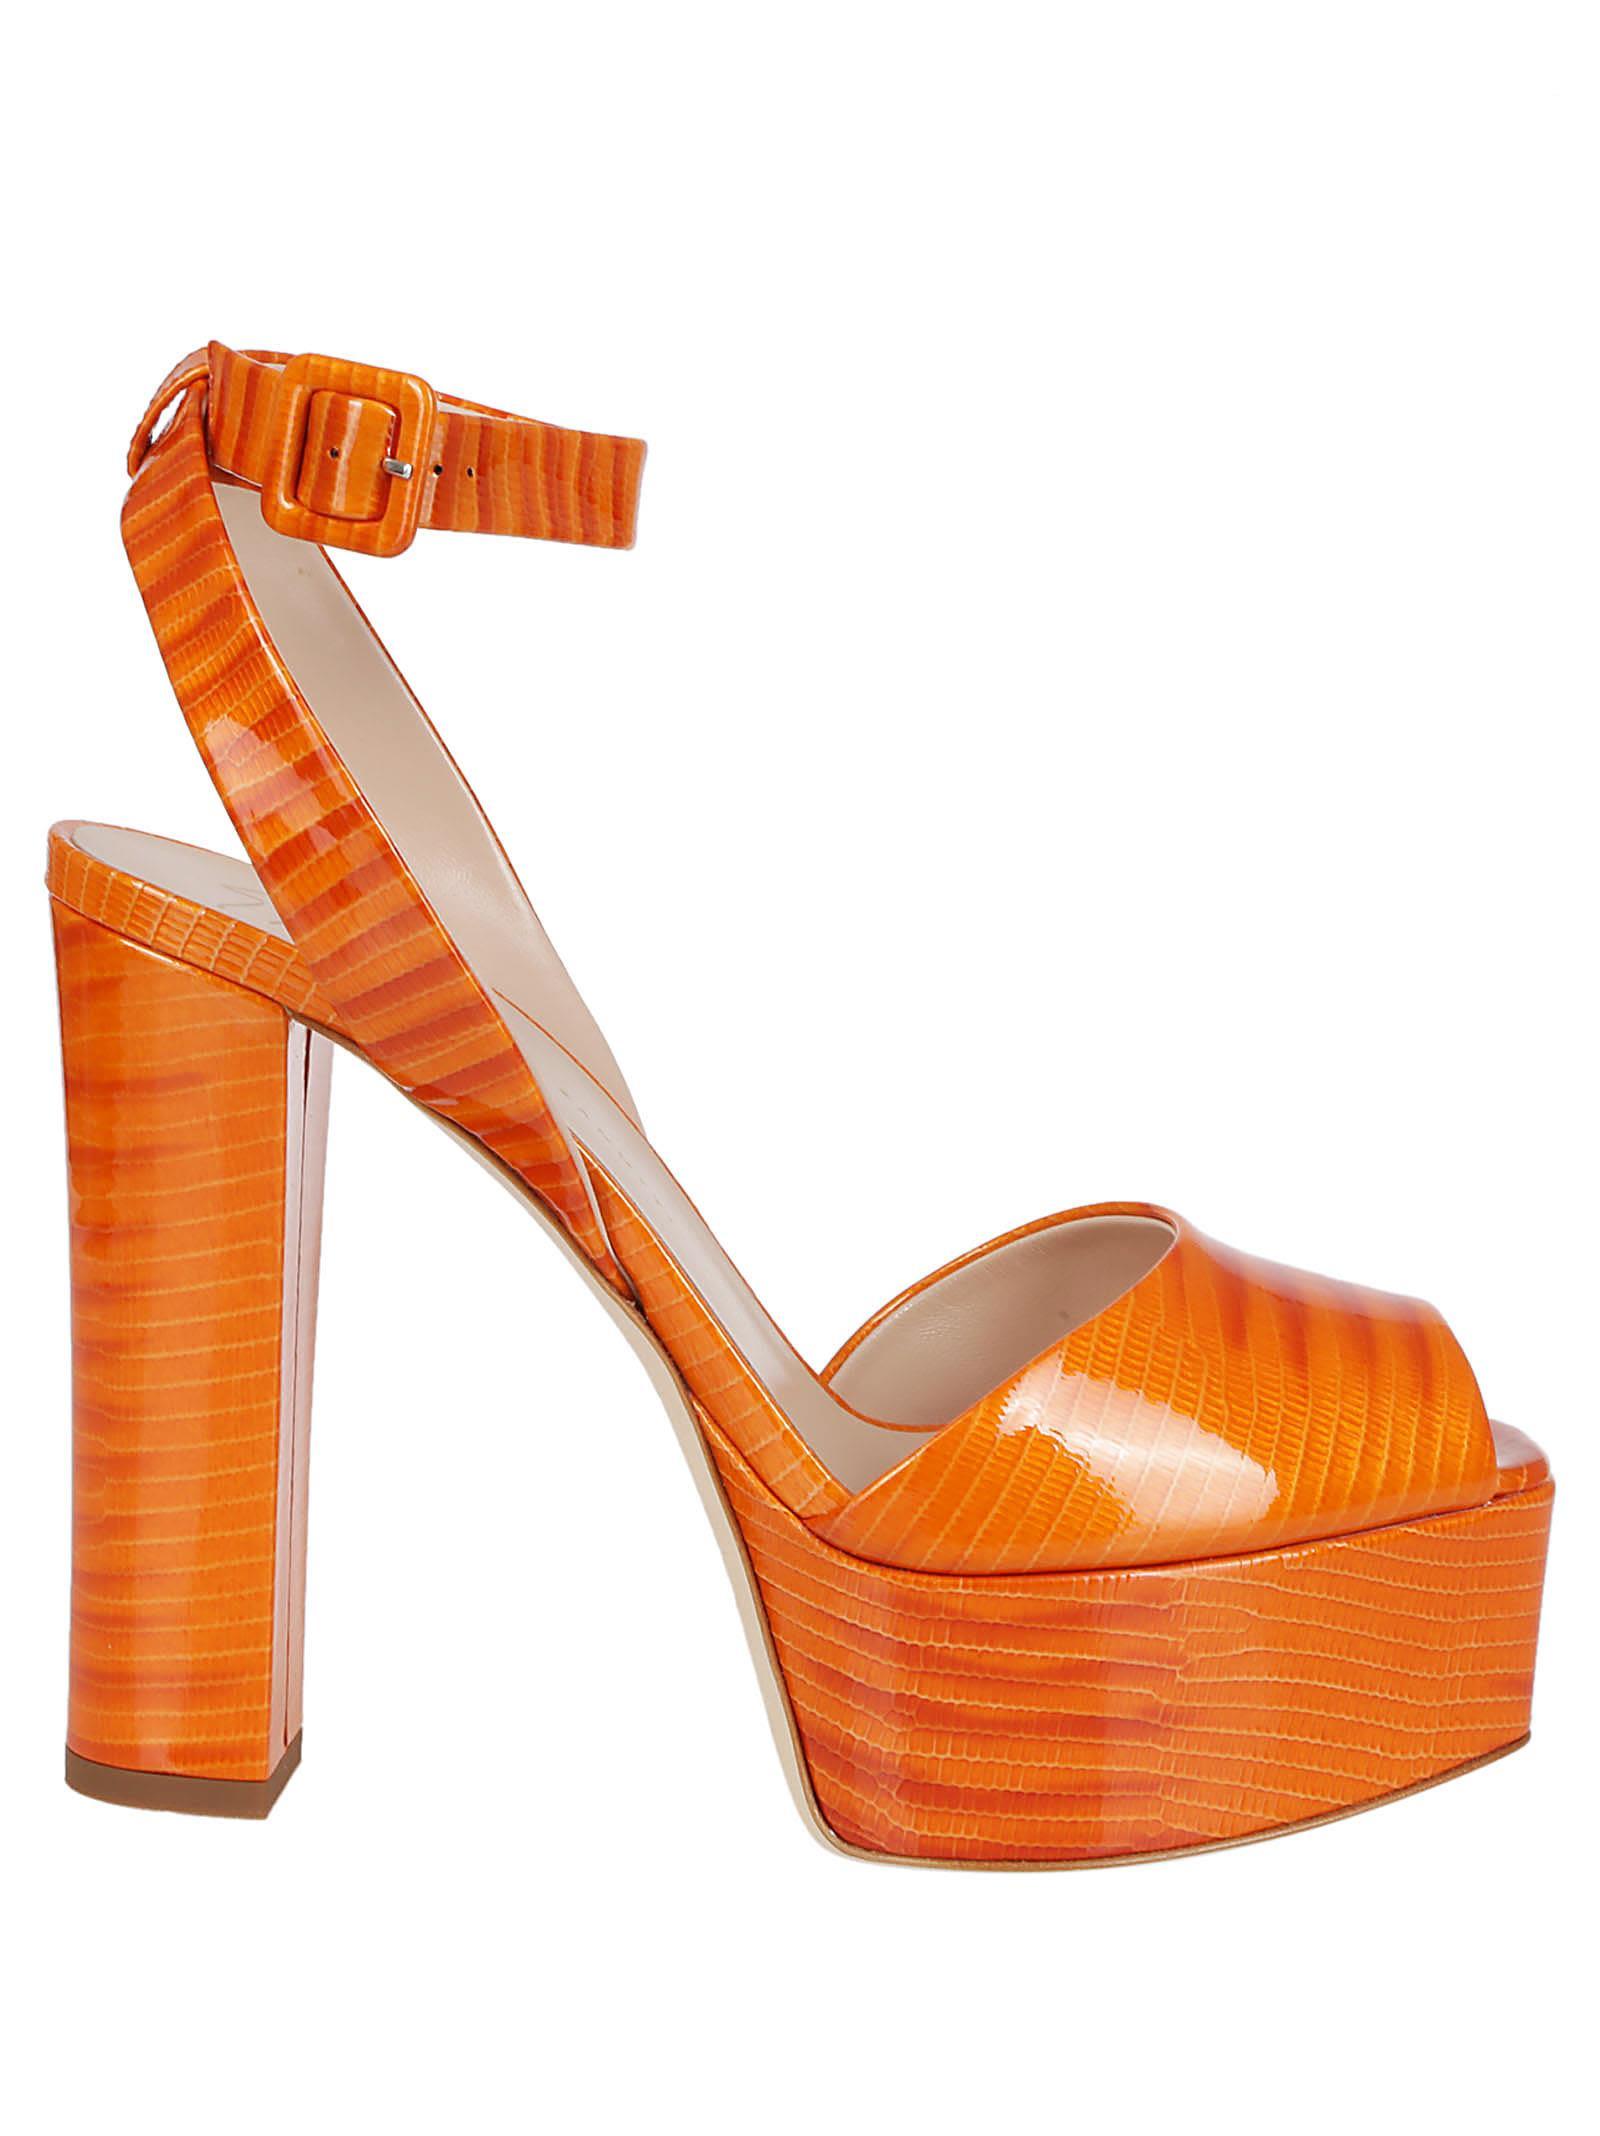 cd9e4948928 Giuseppe Zanotti Giuseppe Zanotti Betty Platform Sandals - Orange ...